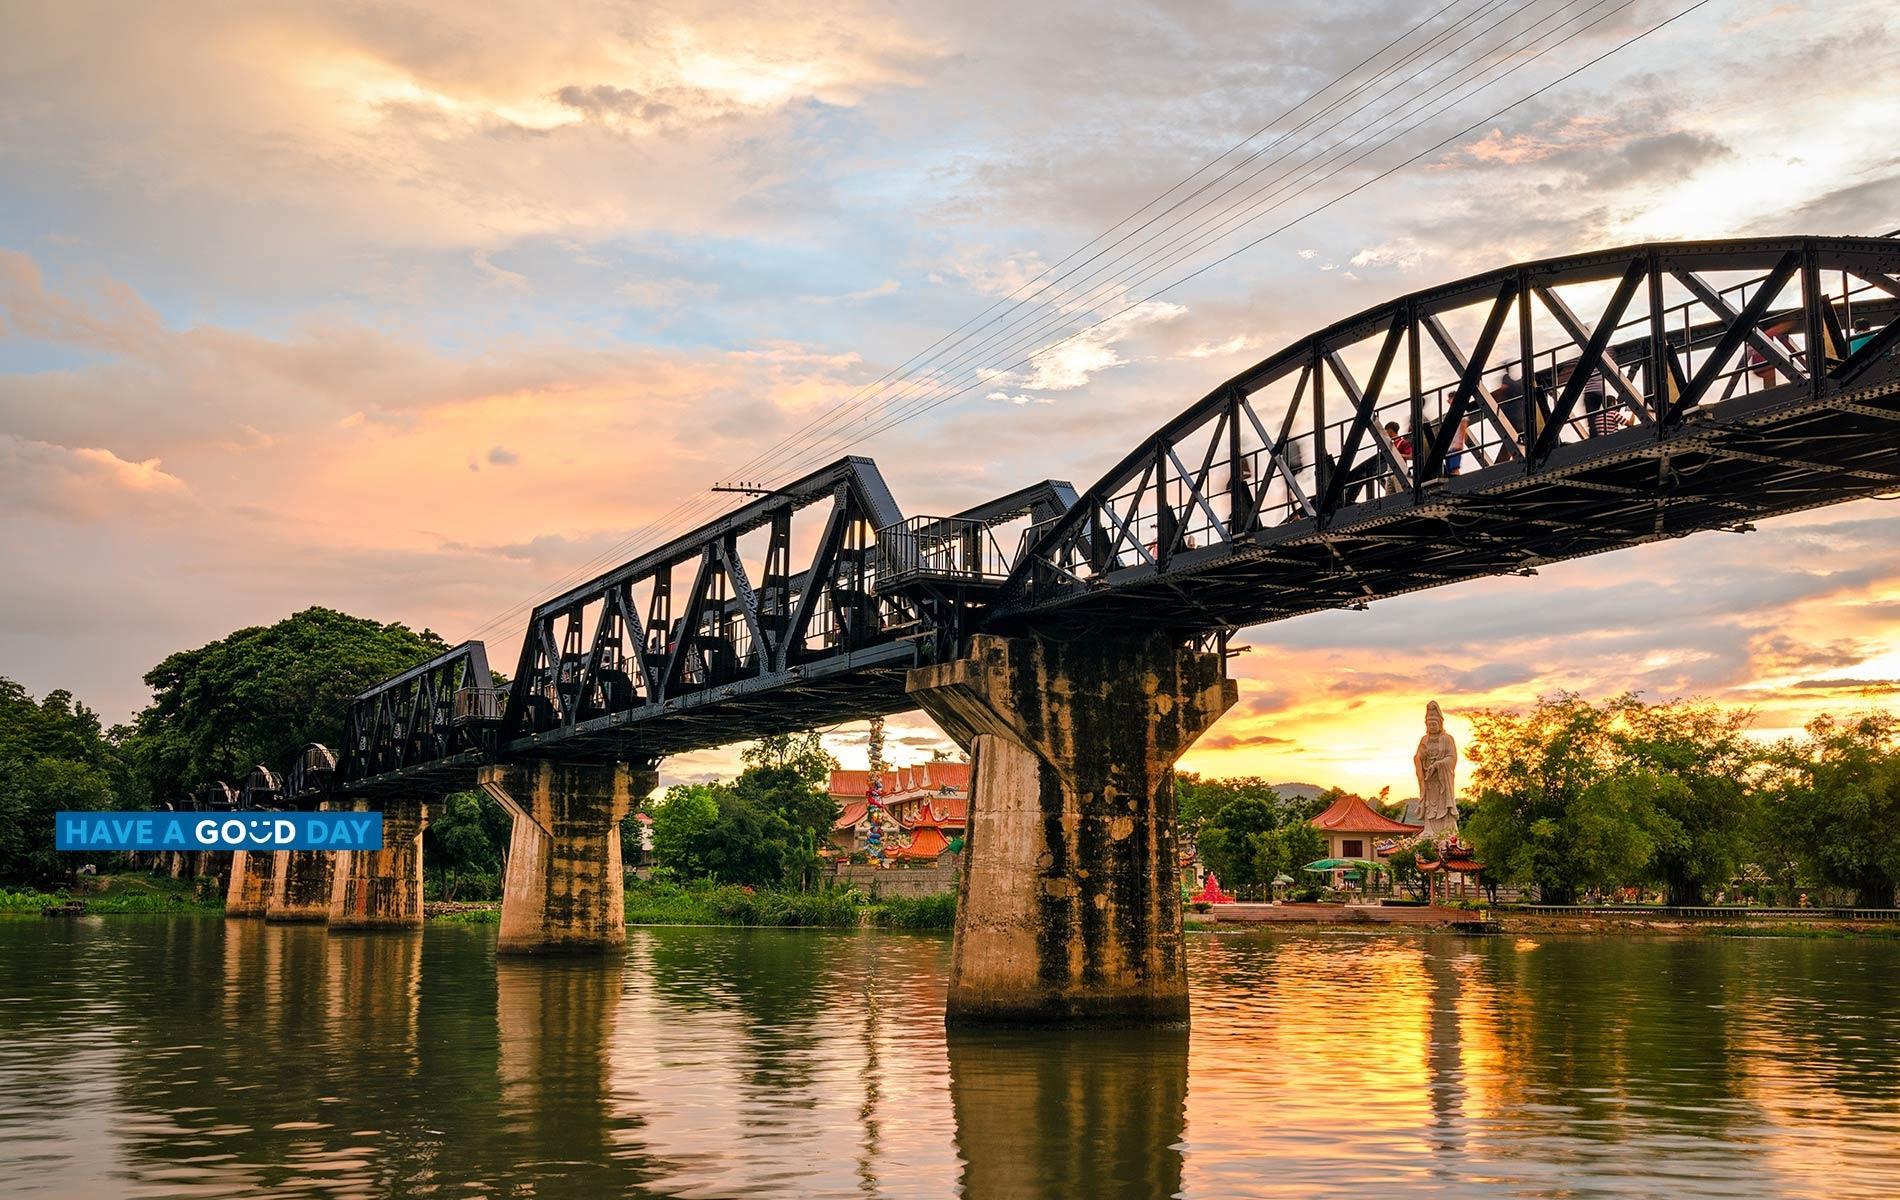 Bridge in Kanchanaburi